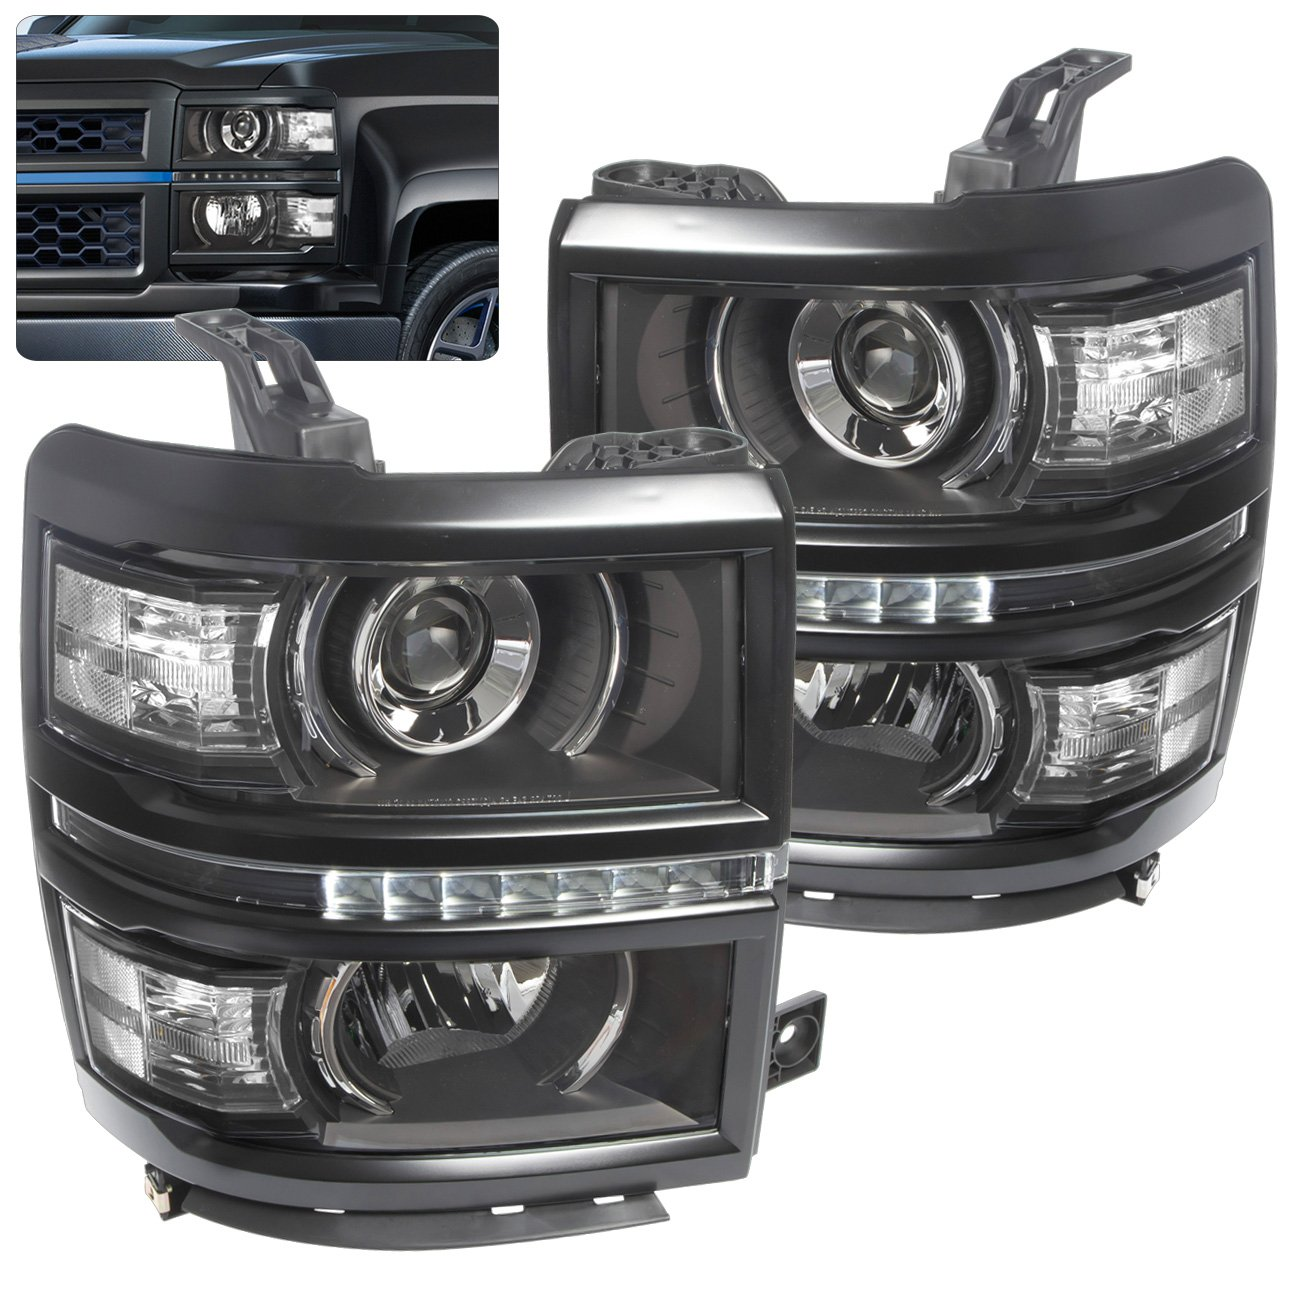 All Chevy 95 chevy headlights : Amazon.com: [U Neon Bar Style] [Black] 2014 2015 Chevy Silverado ...